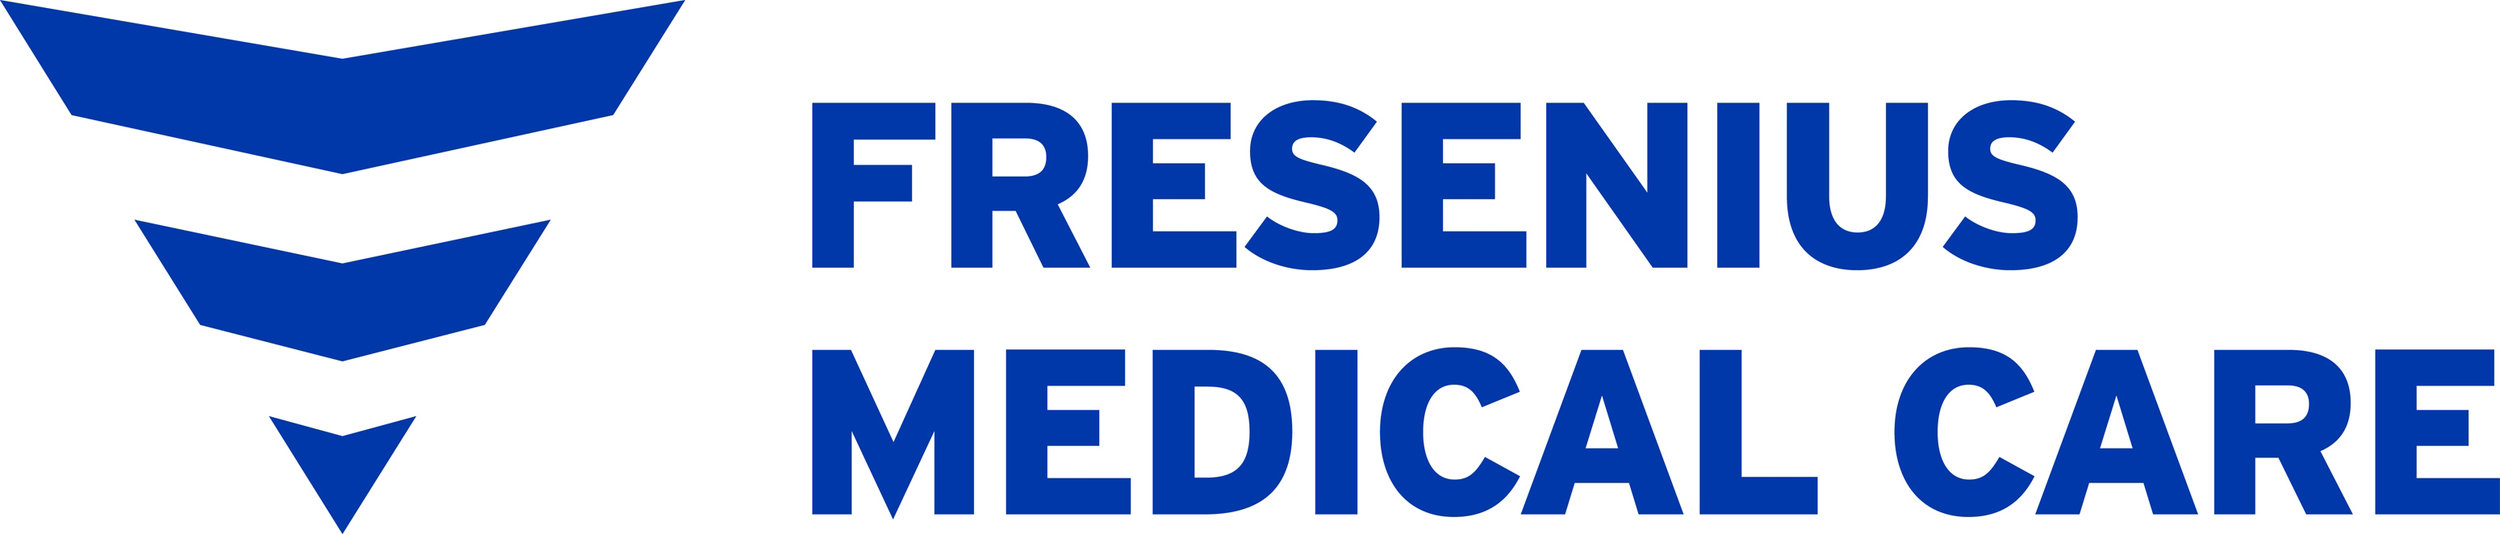 FMC-Logo.jpg